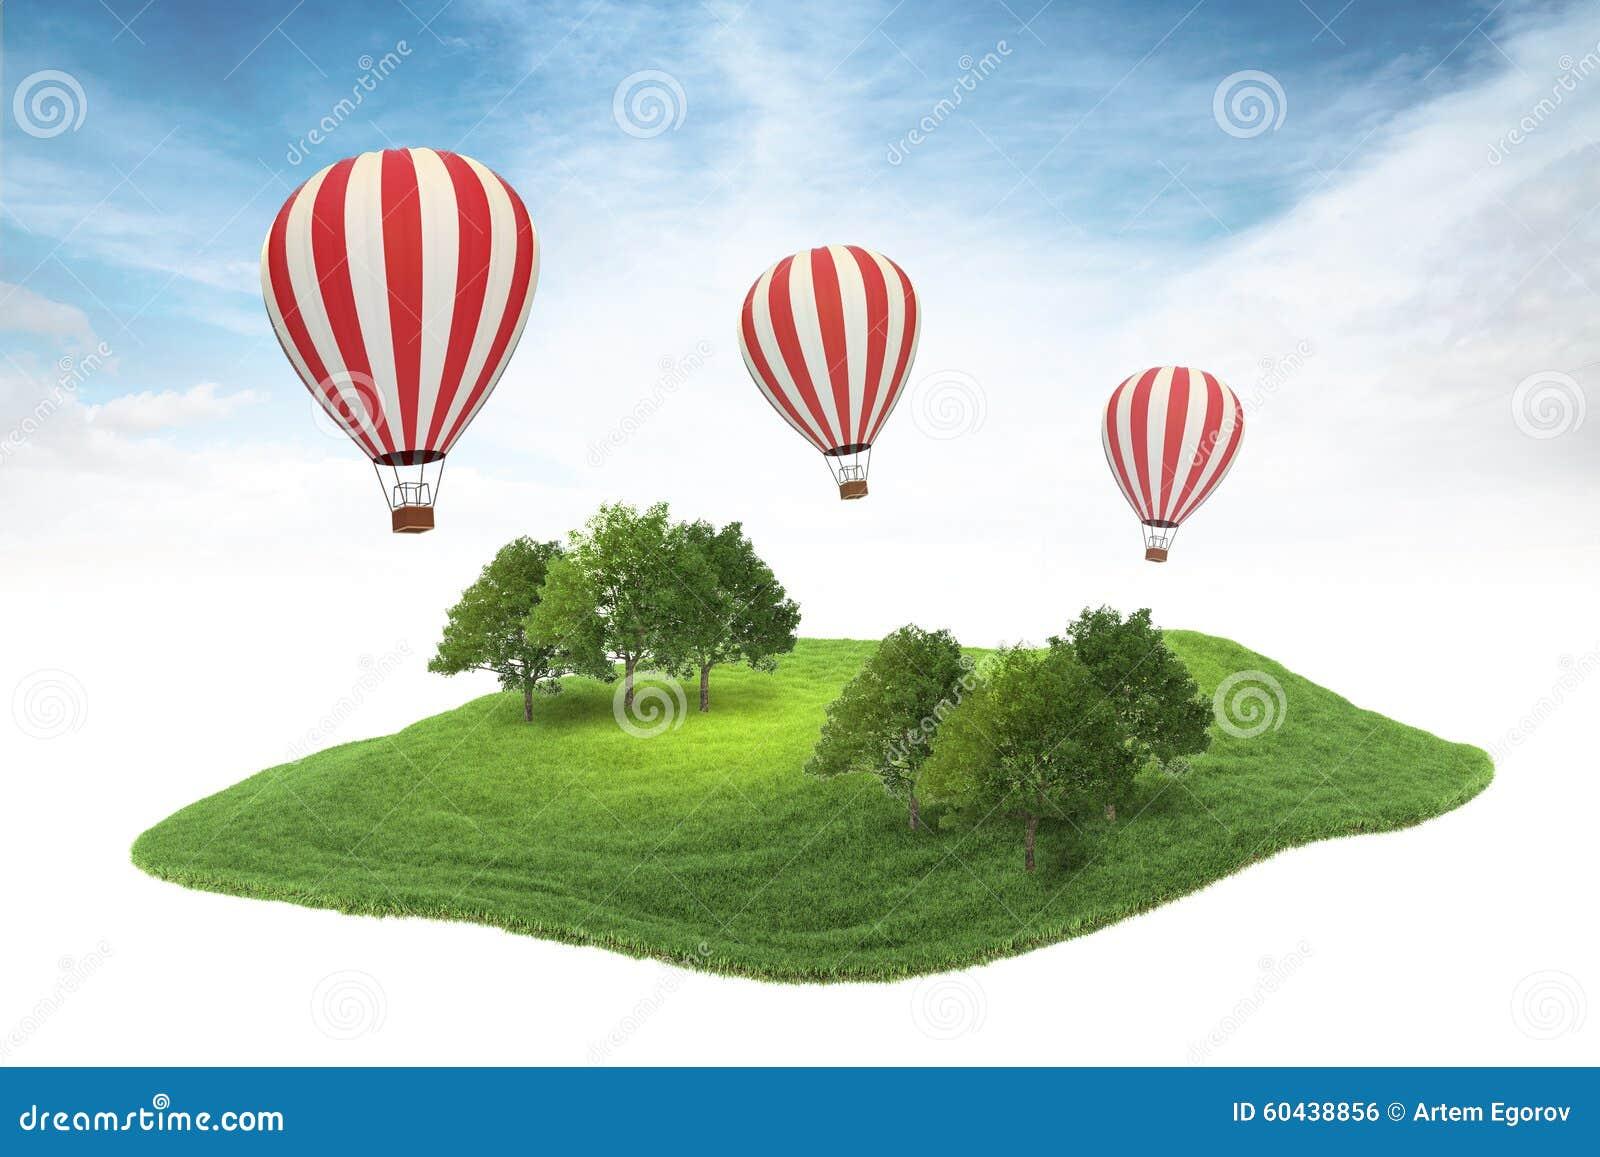 Eilandlap grond met bos en hete luchtballons die I drijven